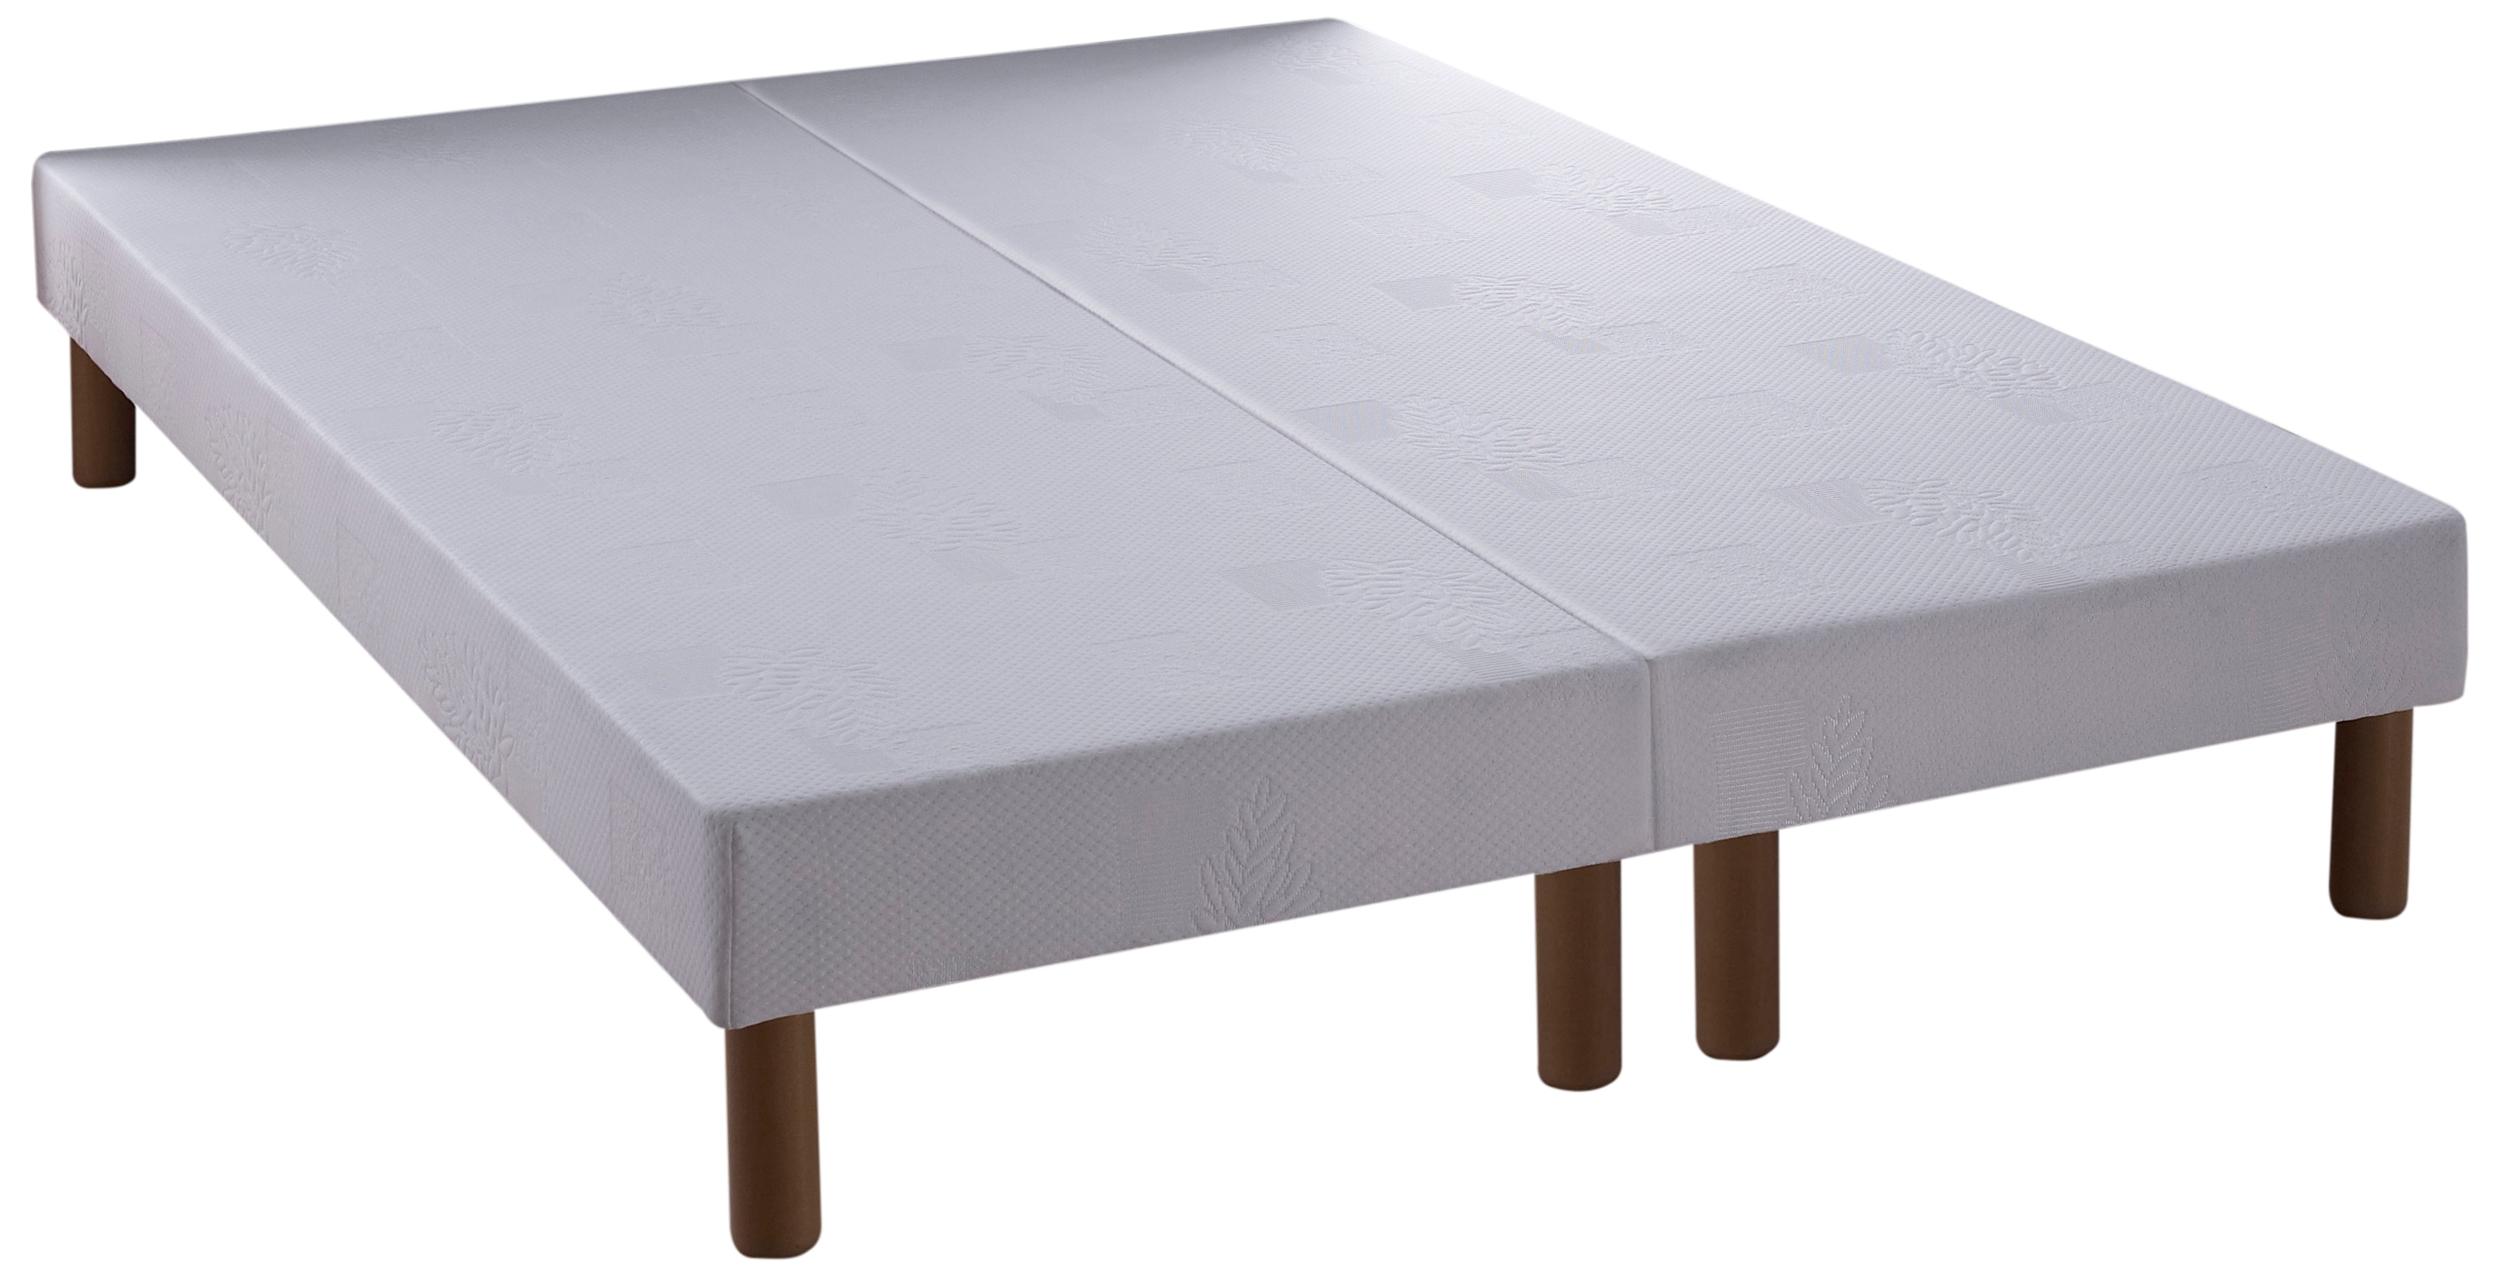 sommier 180 x 200 cm 2 x 90 cm relaxima bande lisse pieds assorti s. Black Bedroom Furniture Sets. Home Design Ideas